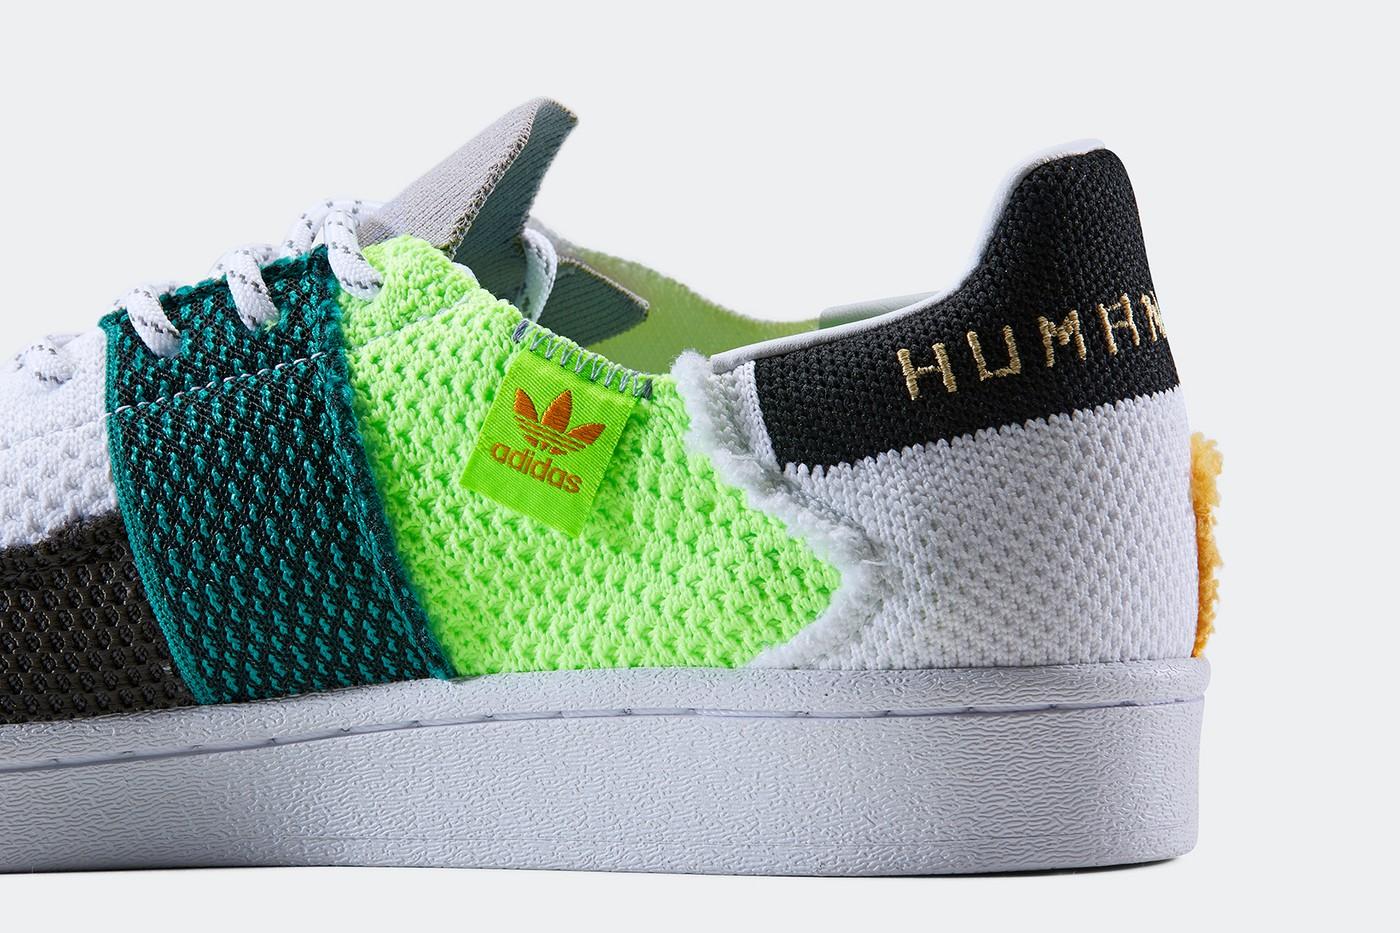 adidas Originals y Pharrell Williams modernizan las clásicas Superstar (6)